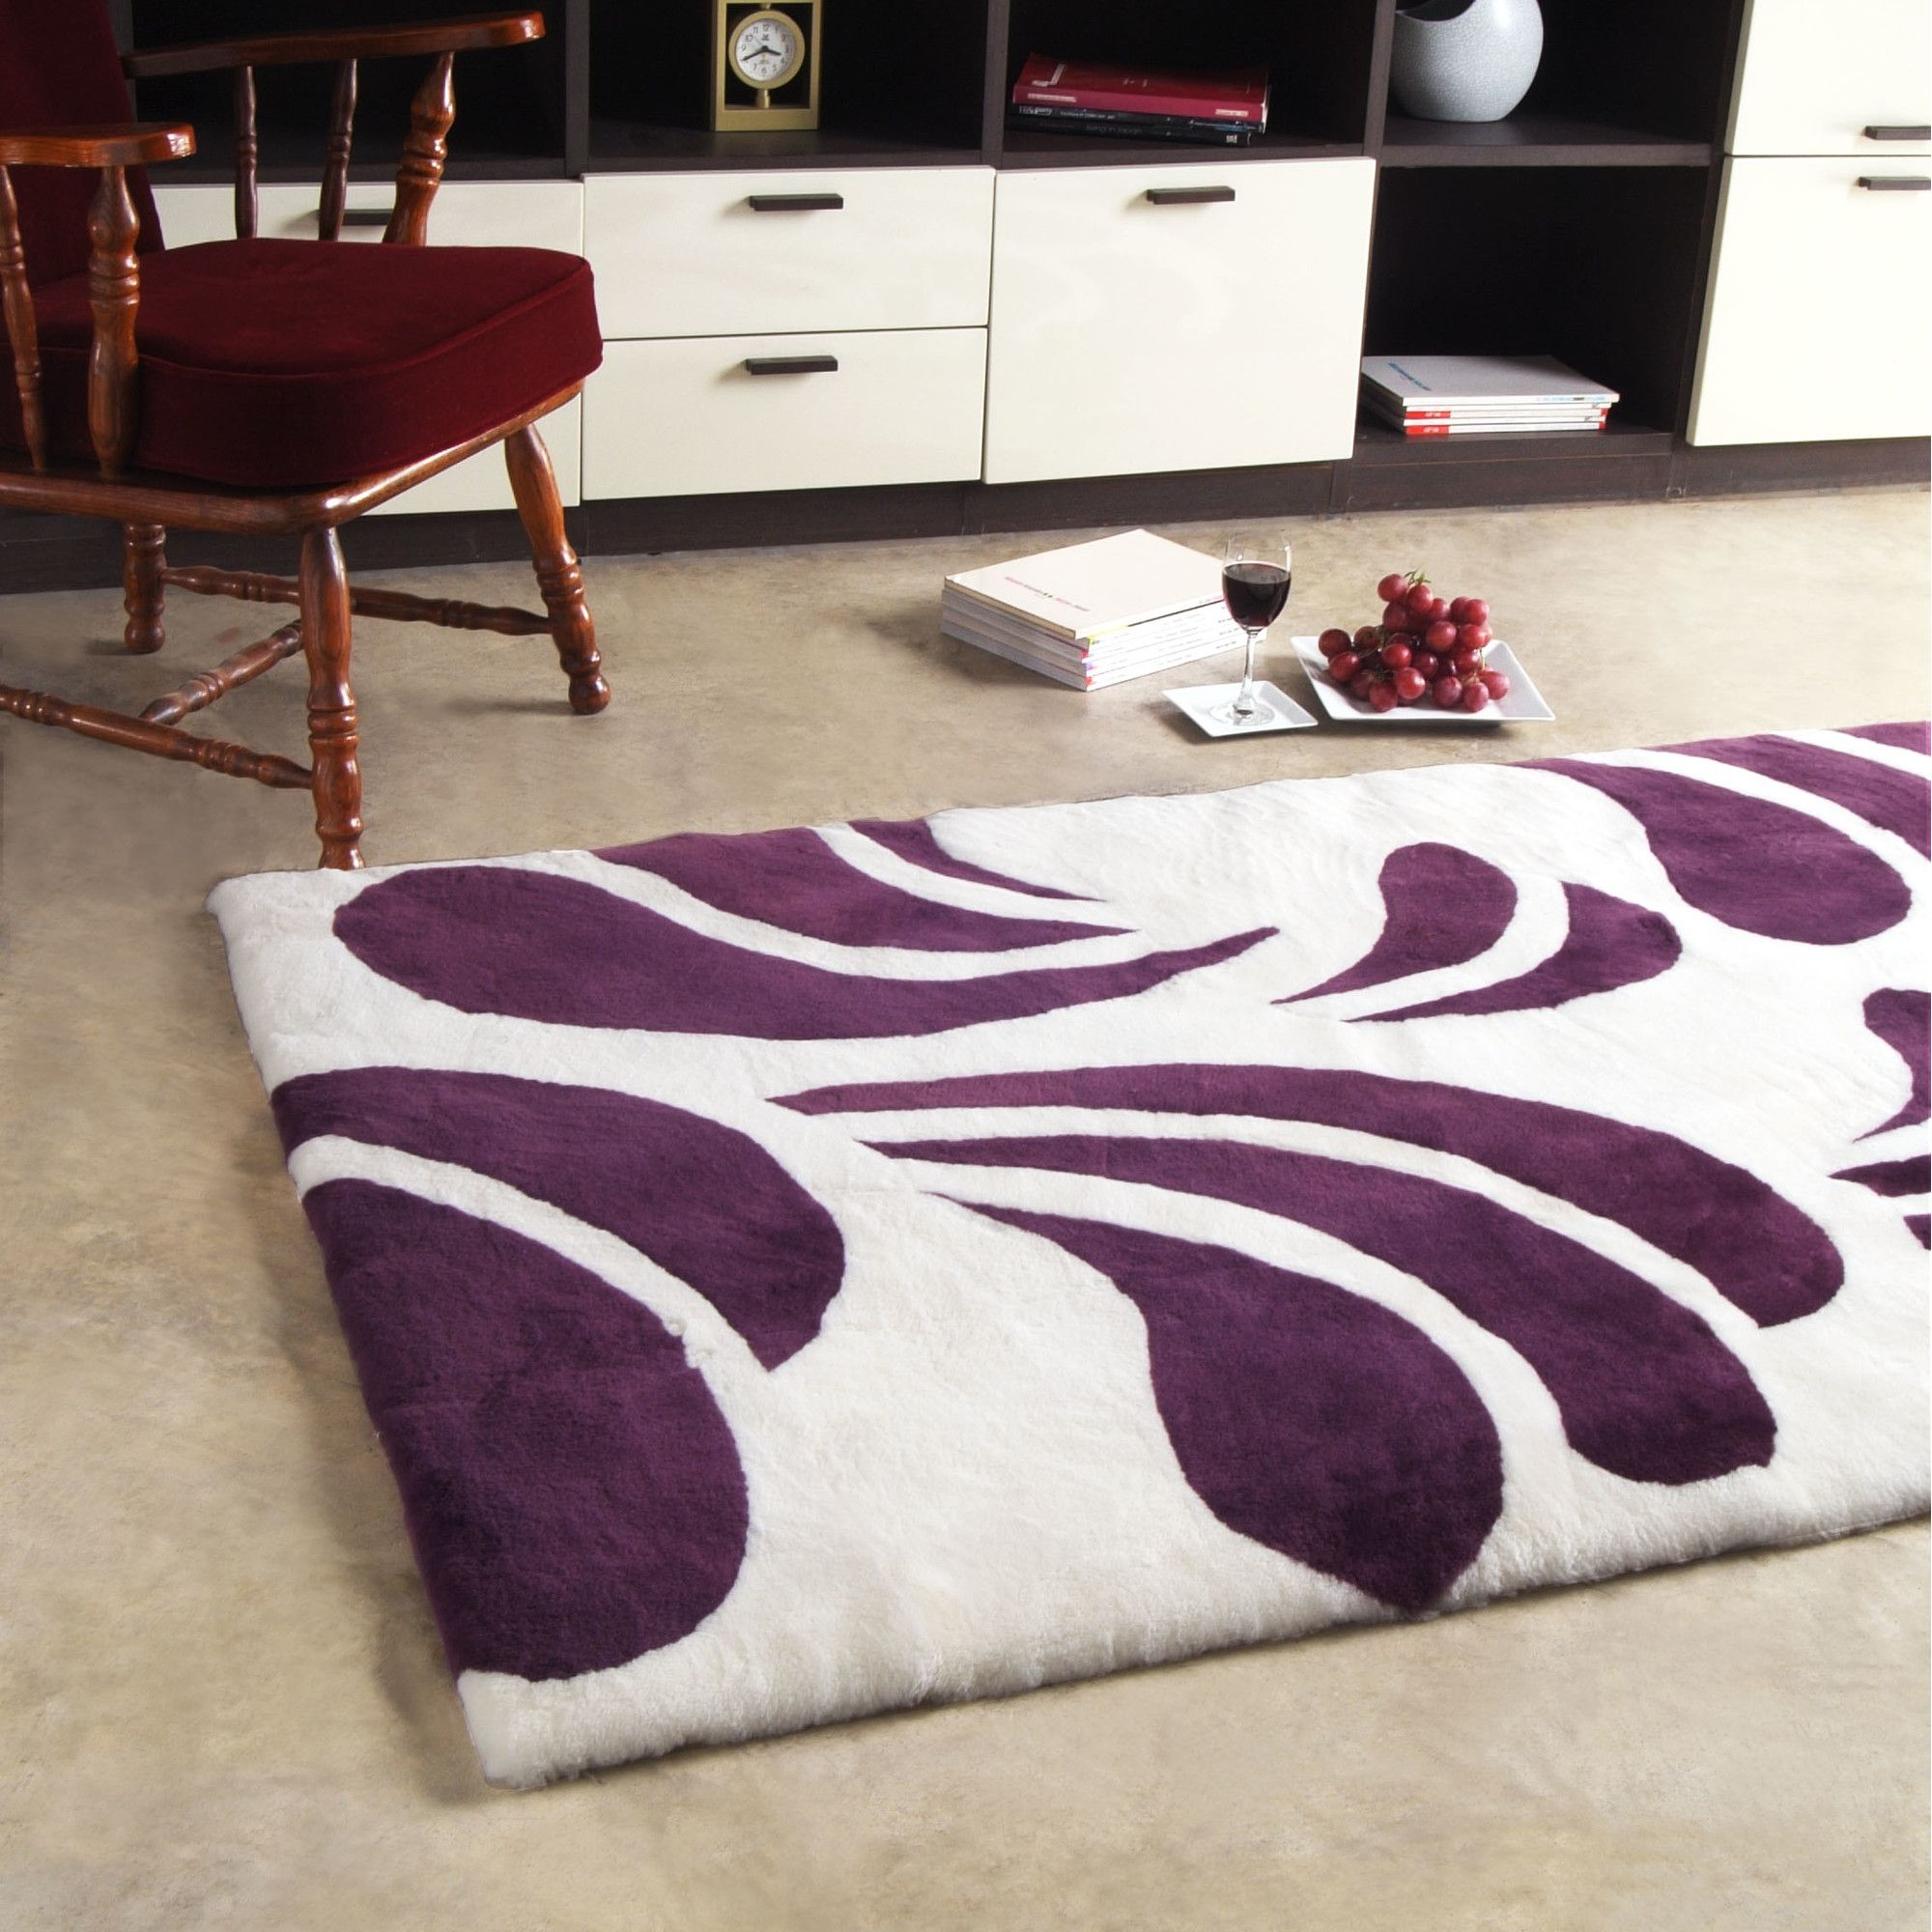 Bowron Sheepskin Shortwool Design Baroque Number 3 Cherry Rug - 65cm H x 240cm W x 1cm D